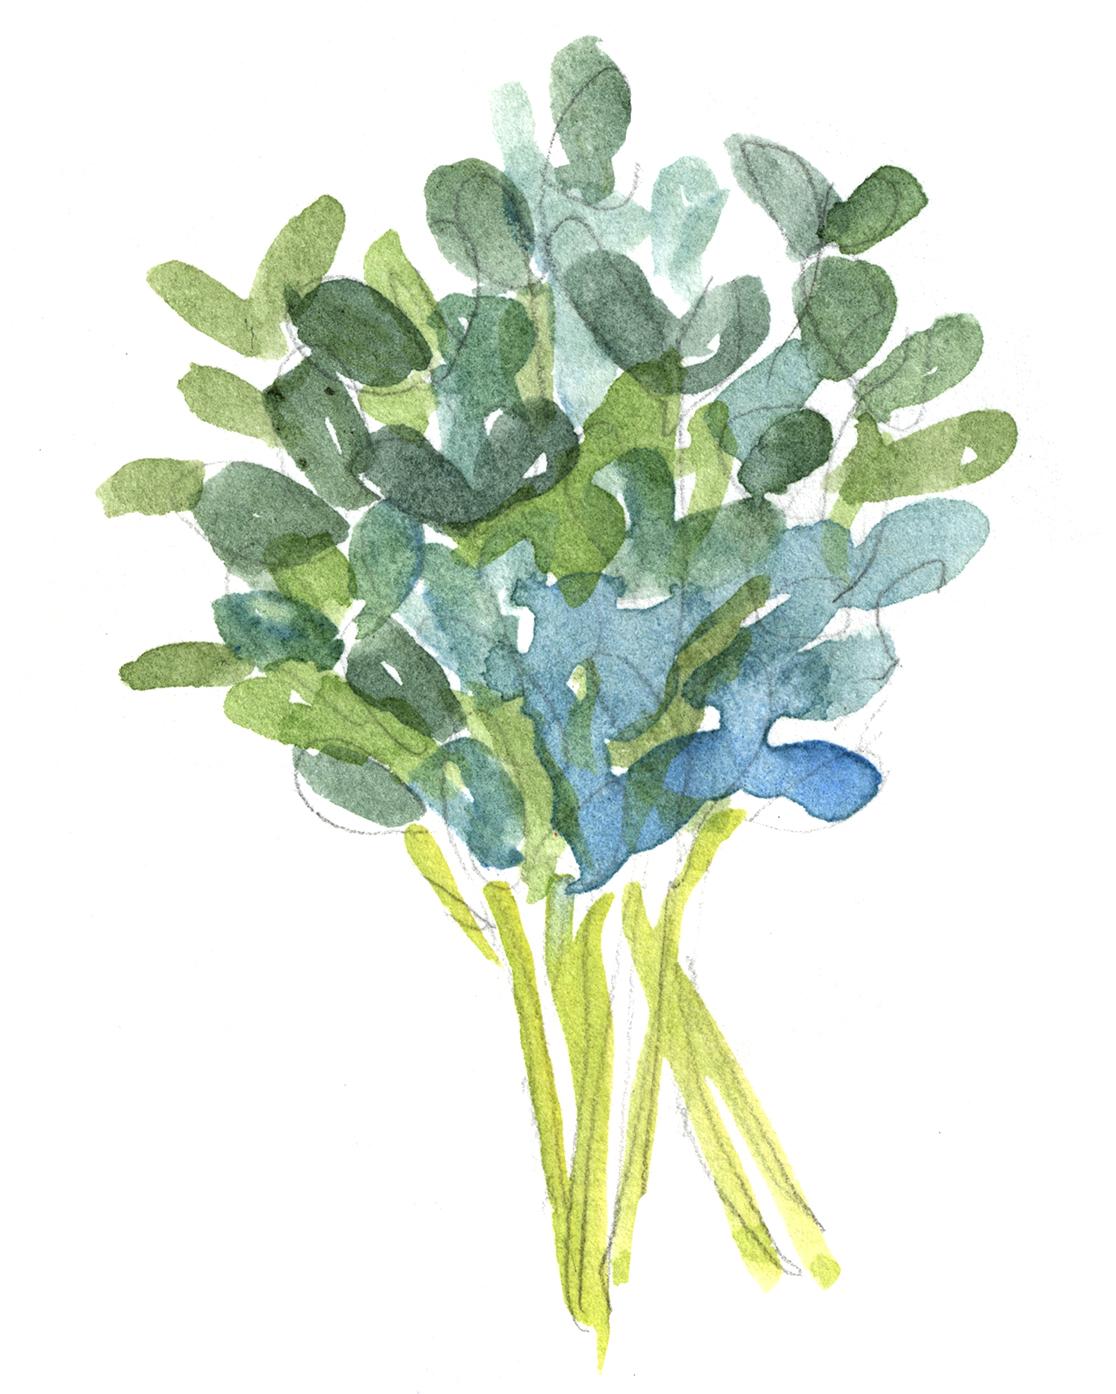 pea shoots illustration